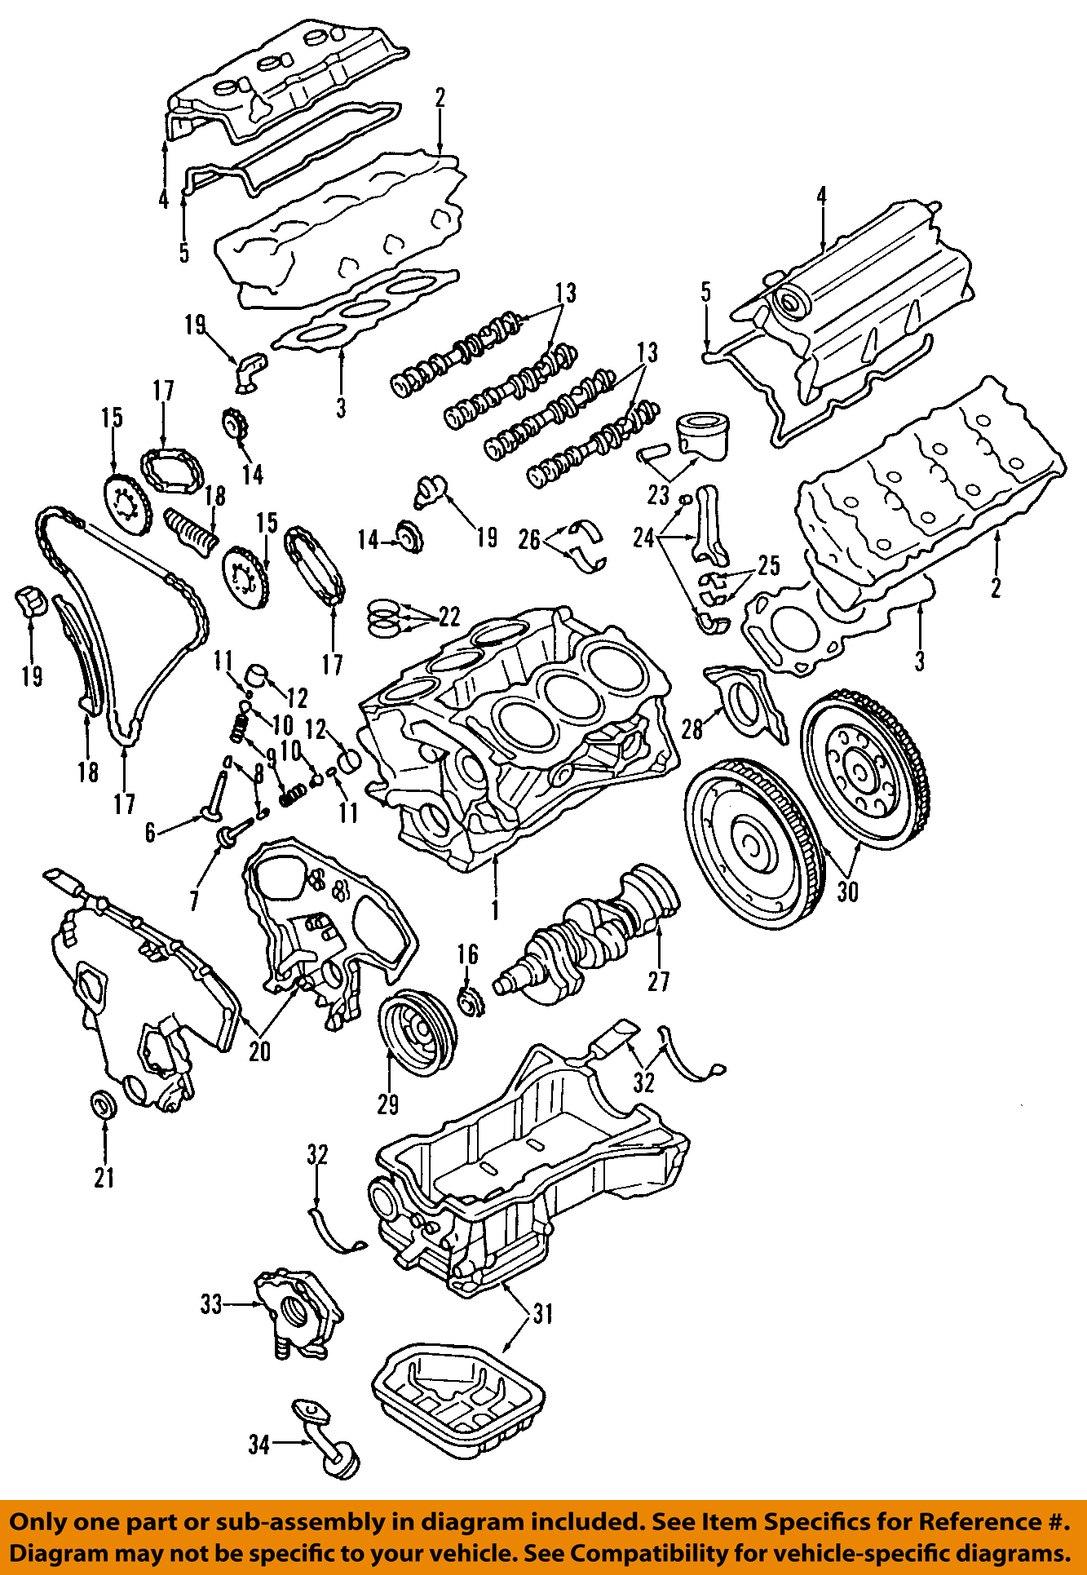 1998 Nissan Quest Engine Diagram Basic Guide Wiring 96 Oem 04 09 Timing Cover 135007y00b Ebay Rh Com 2004 2000 Parts